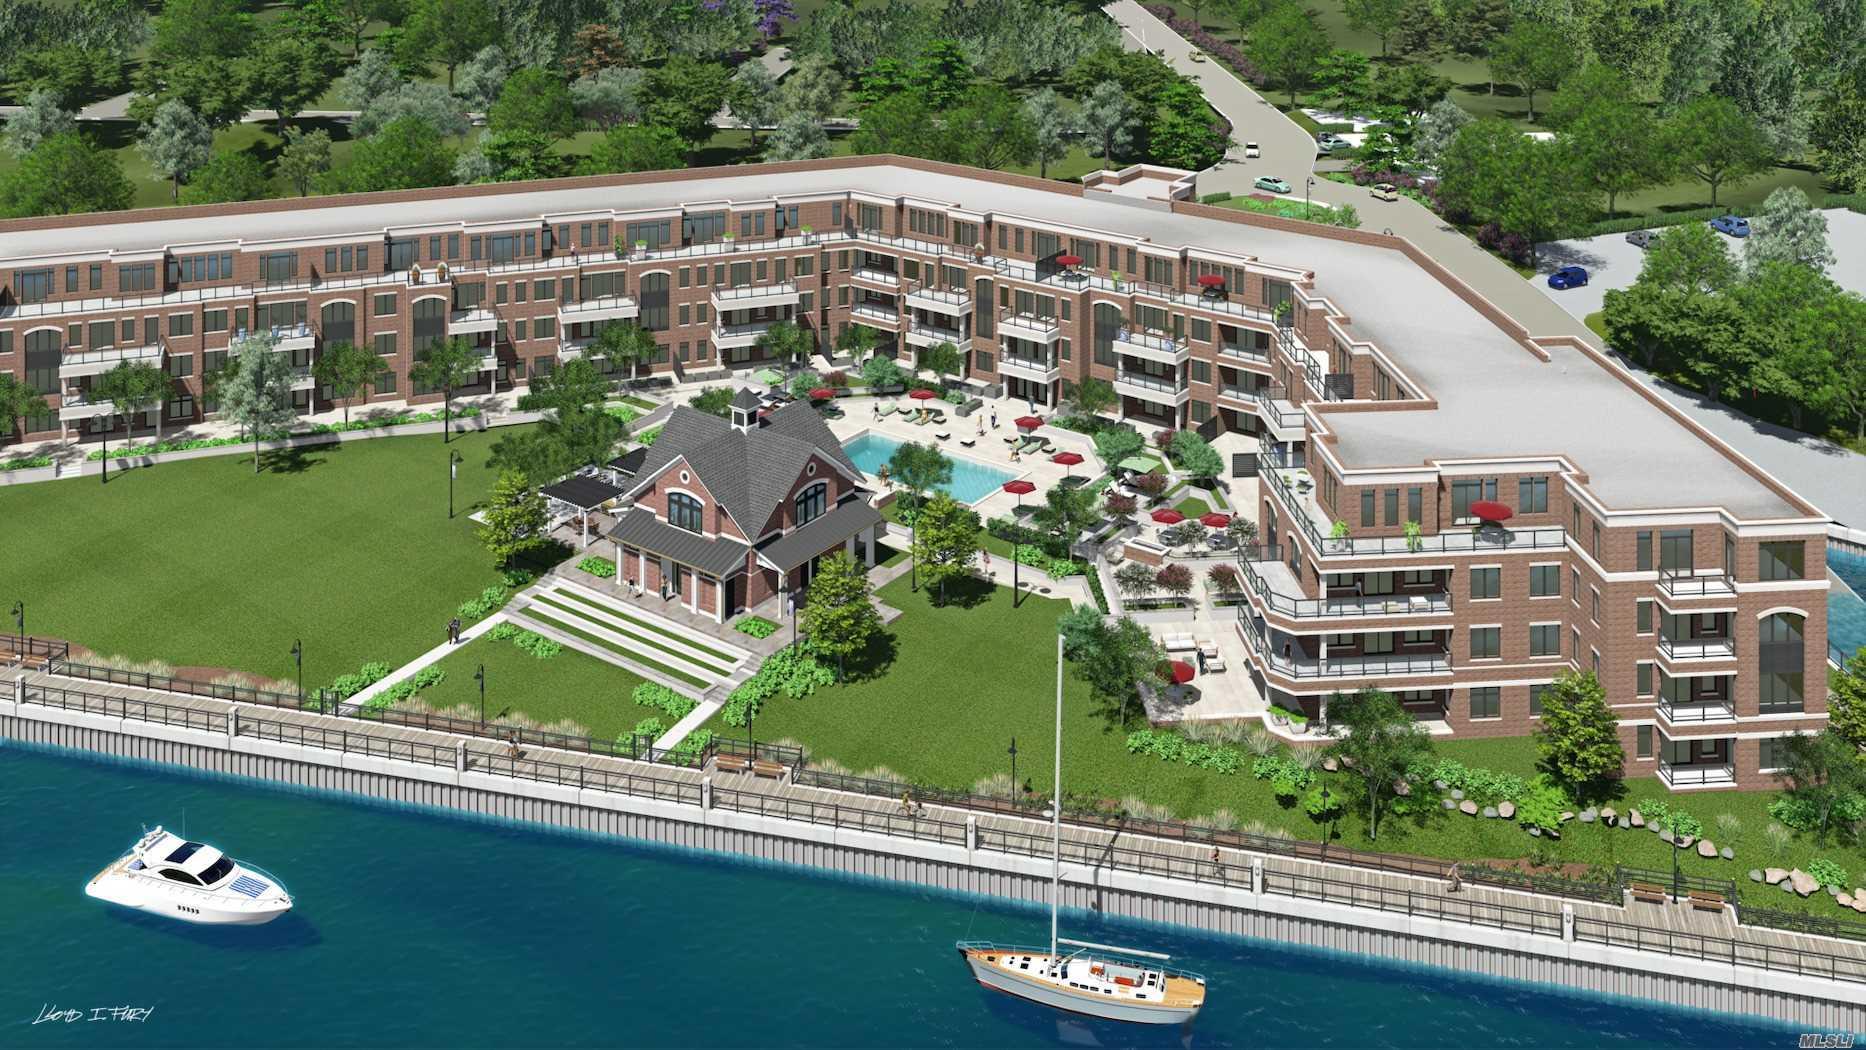 Property for sale at 10 Shore Road # 205, Glenwood Landing NY 11547, Glenwood Landing,  New York 11547